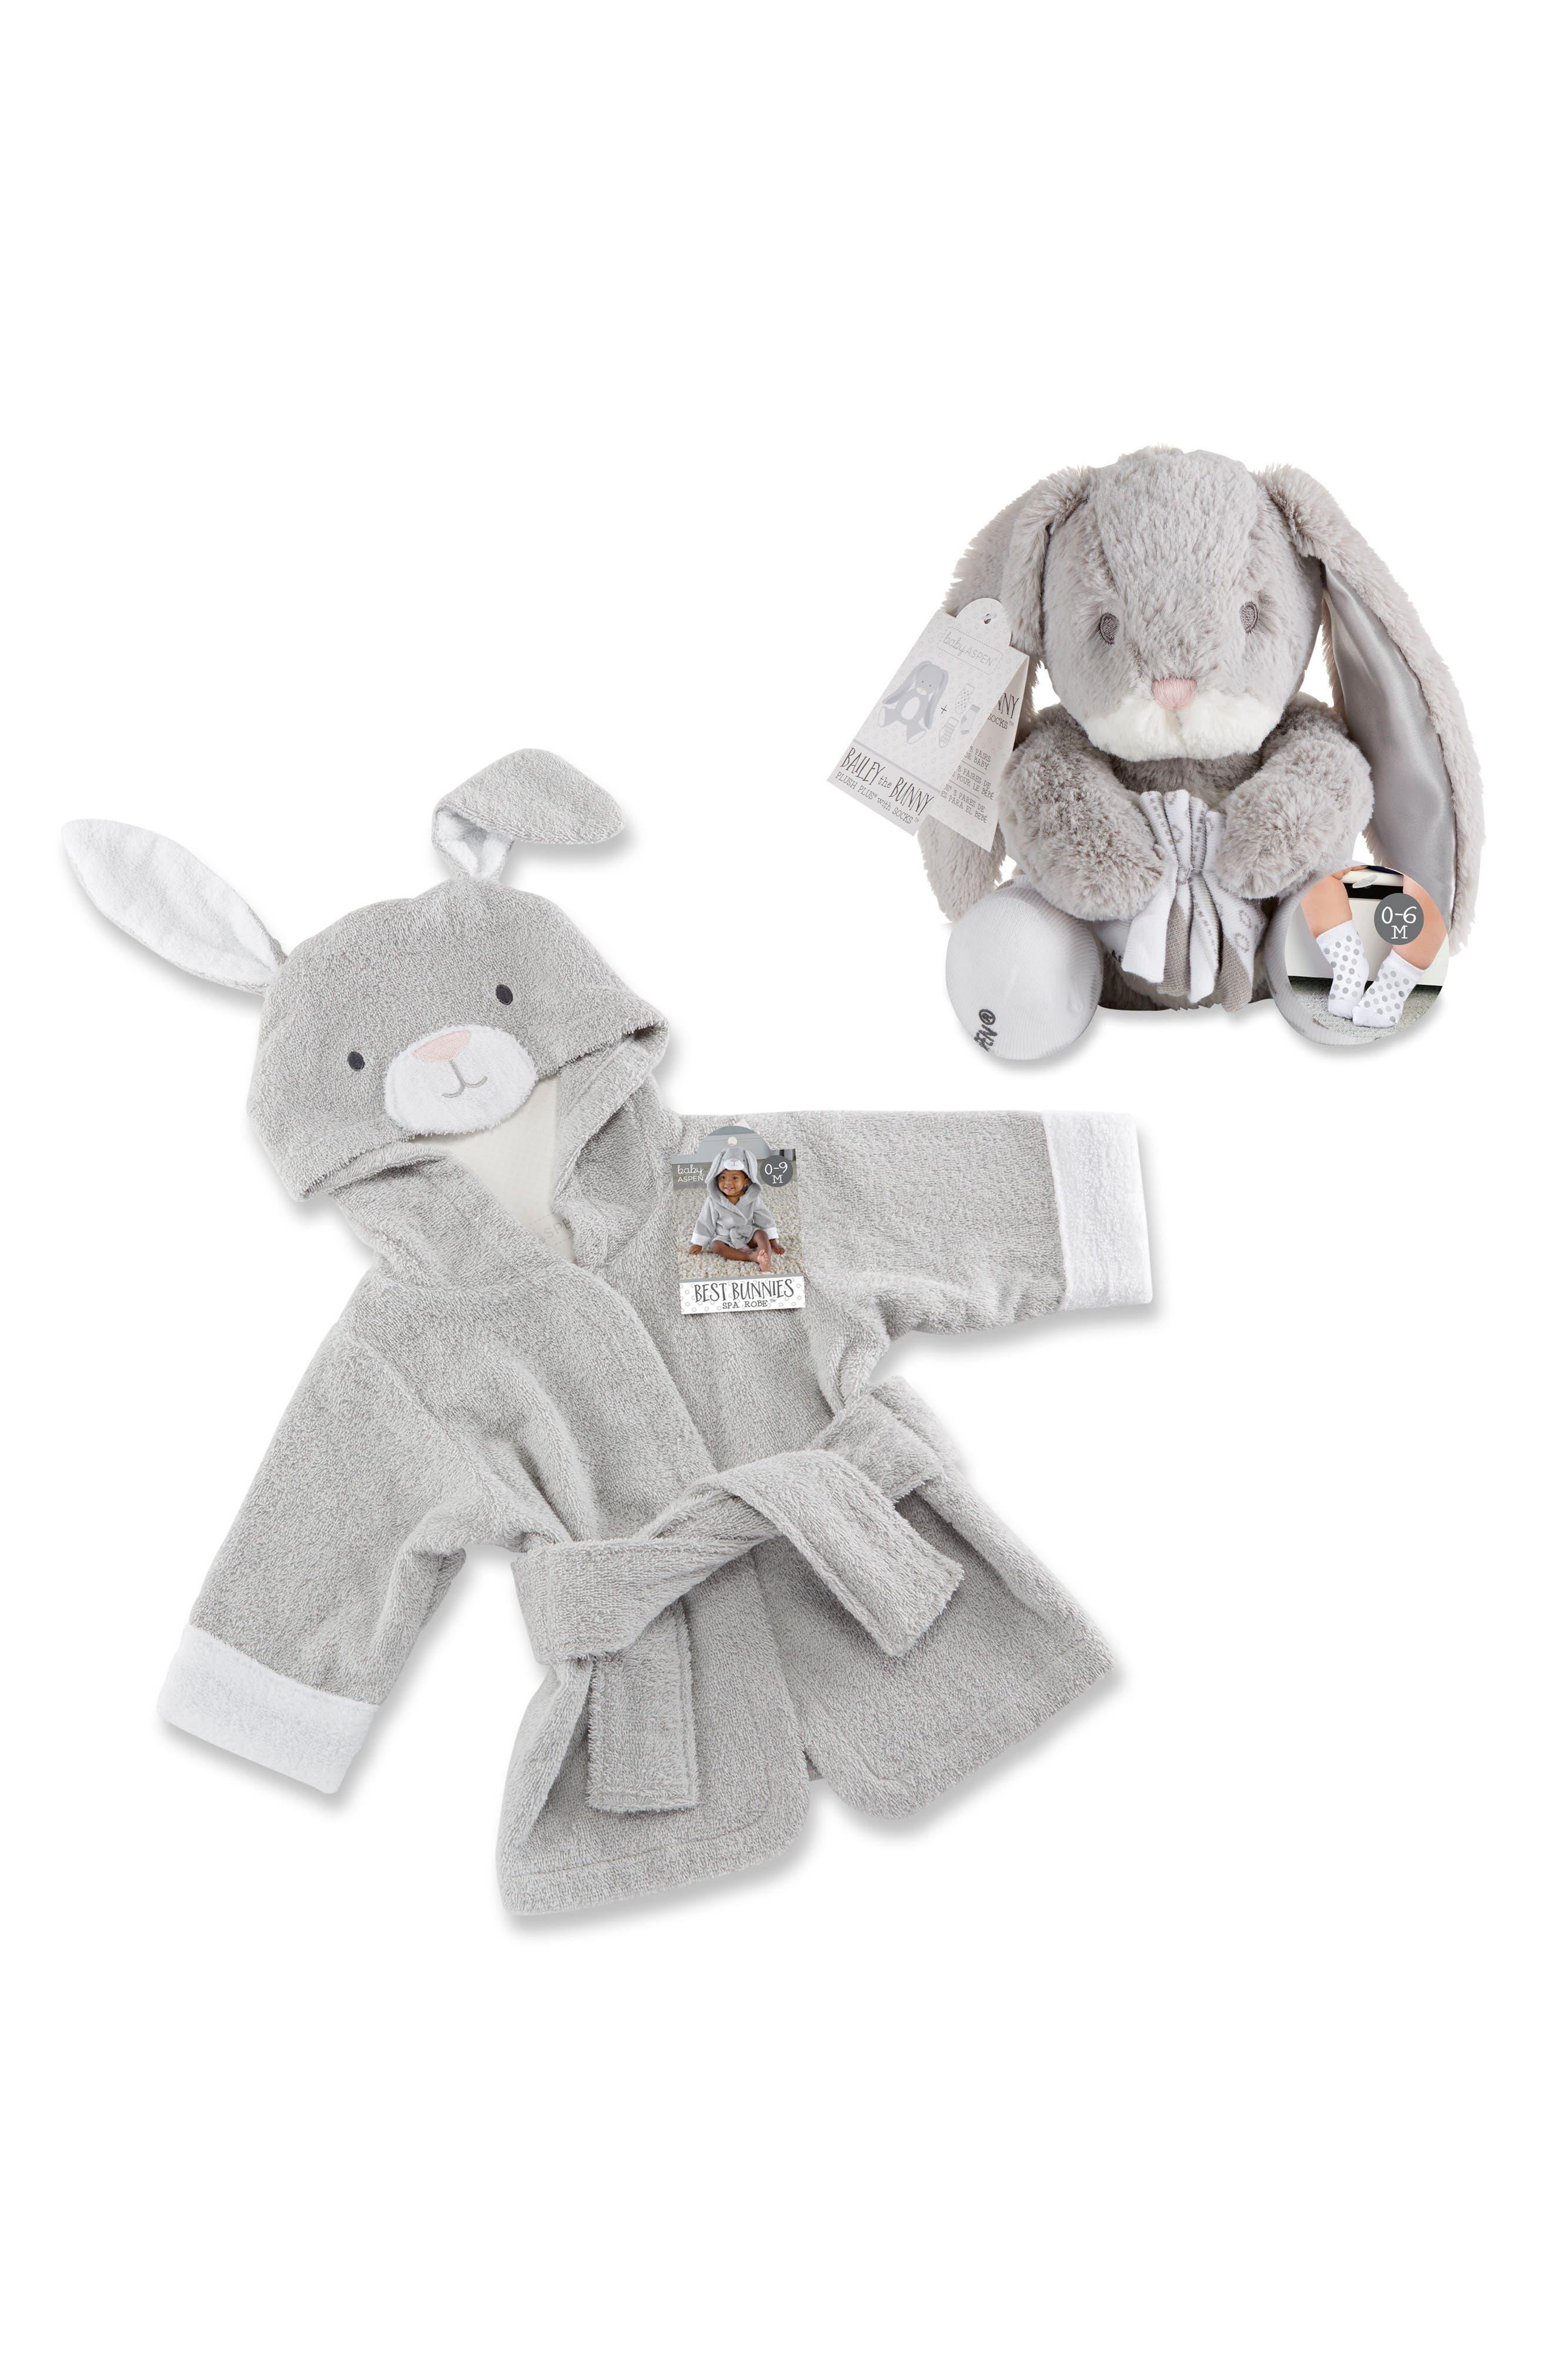 Main Image - Baby Aspen Bunnie Hooded Robe & Stuffed Animal